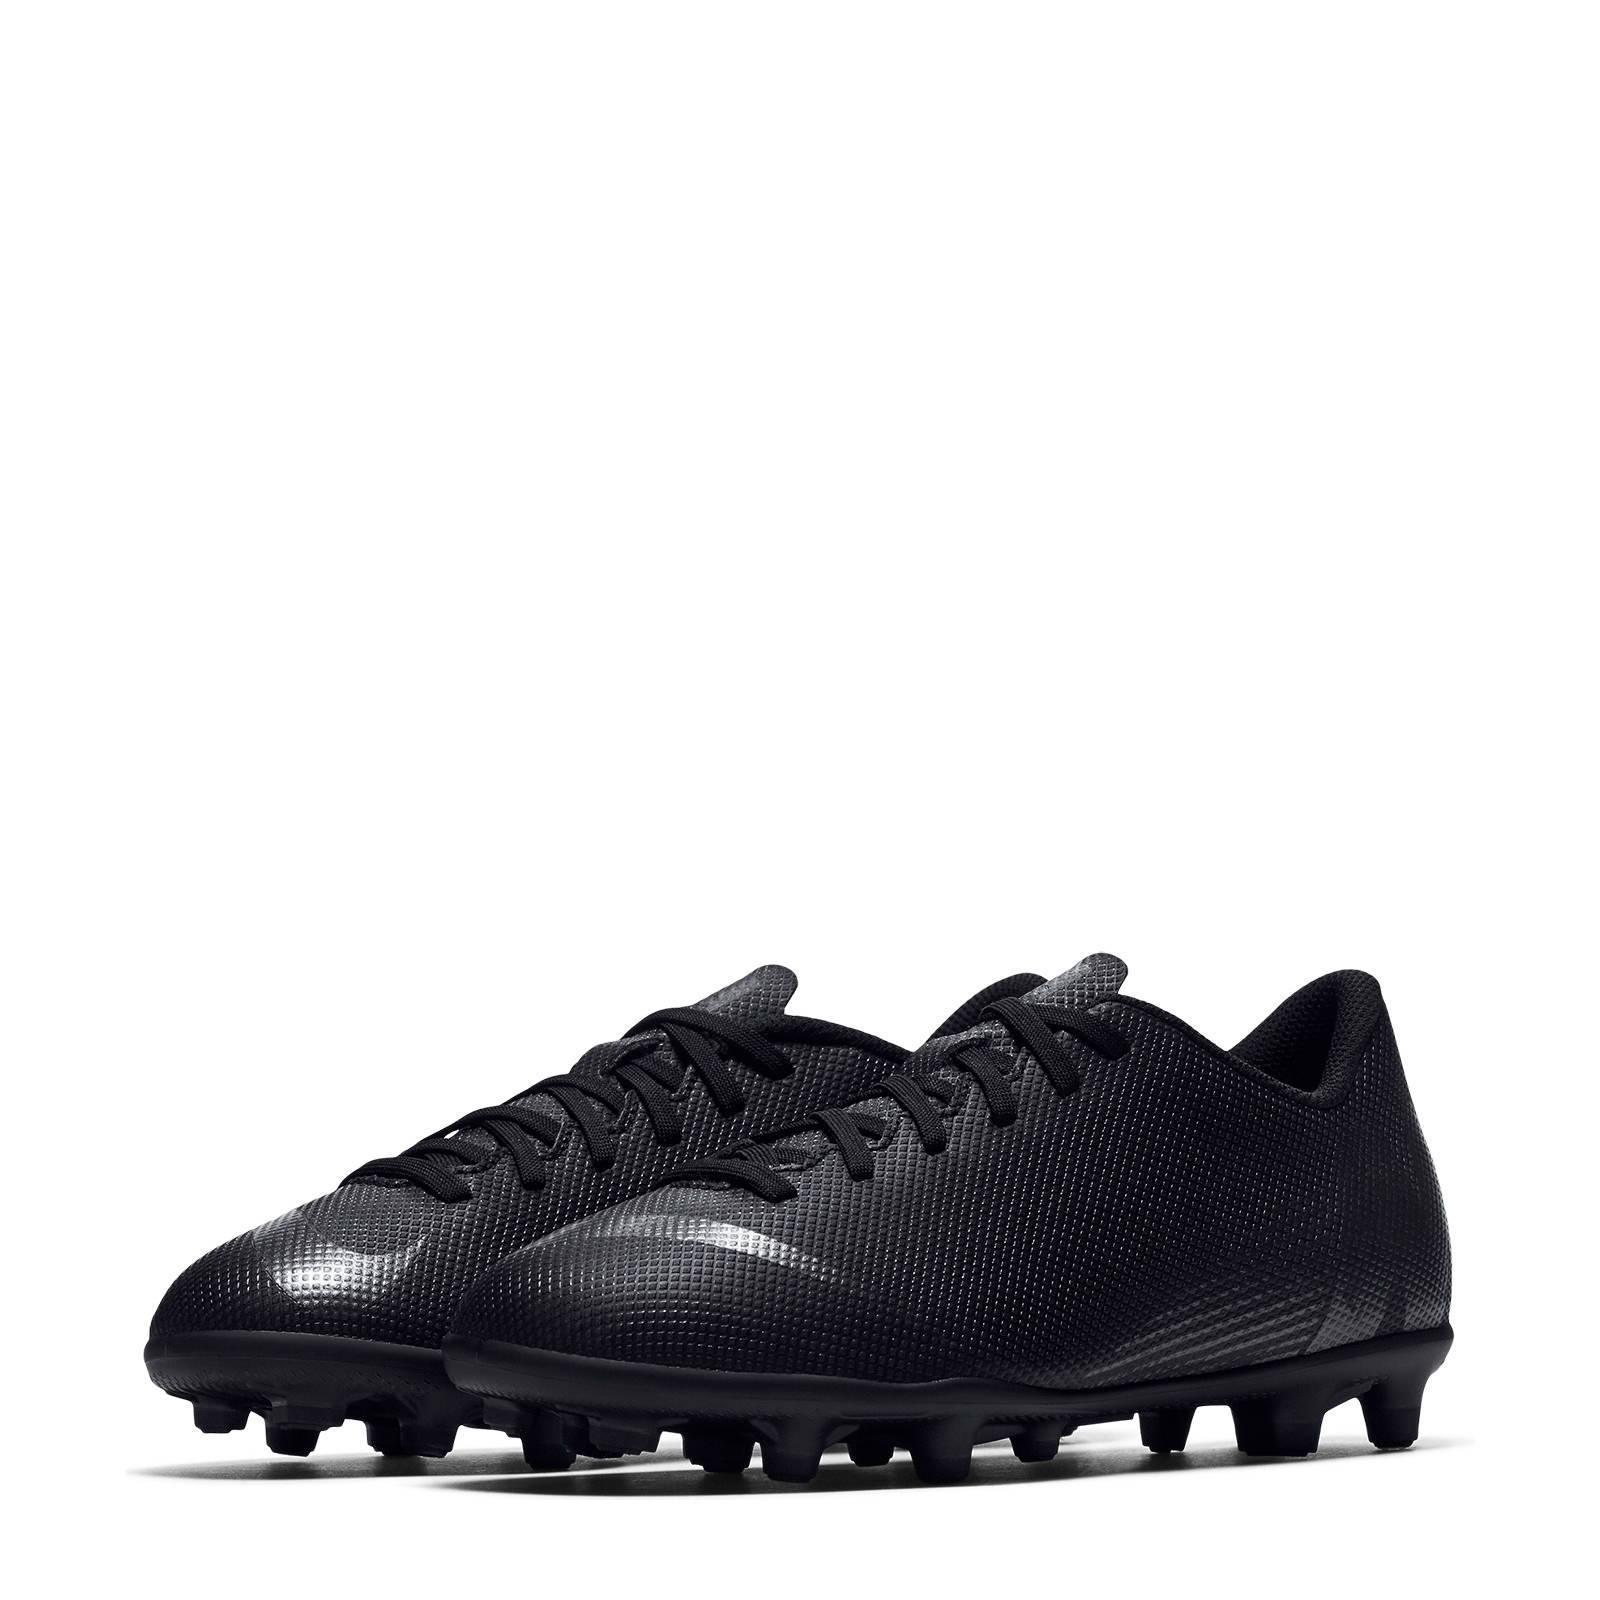 Nike JR Vapor 12 Club GS FGMG voetbalschoenen zwart   wehkamp